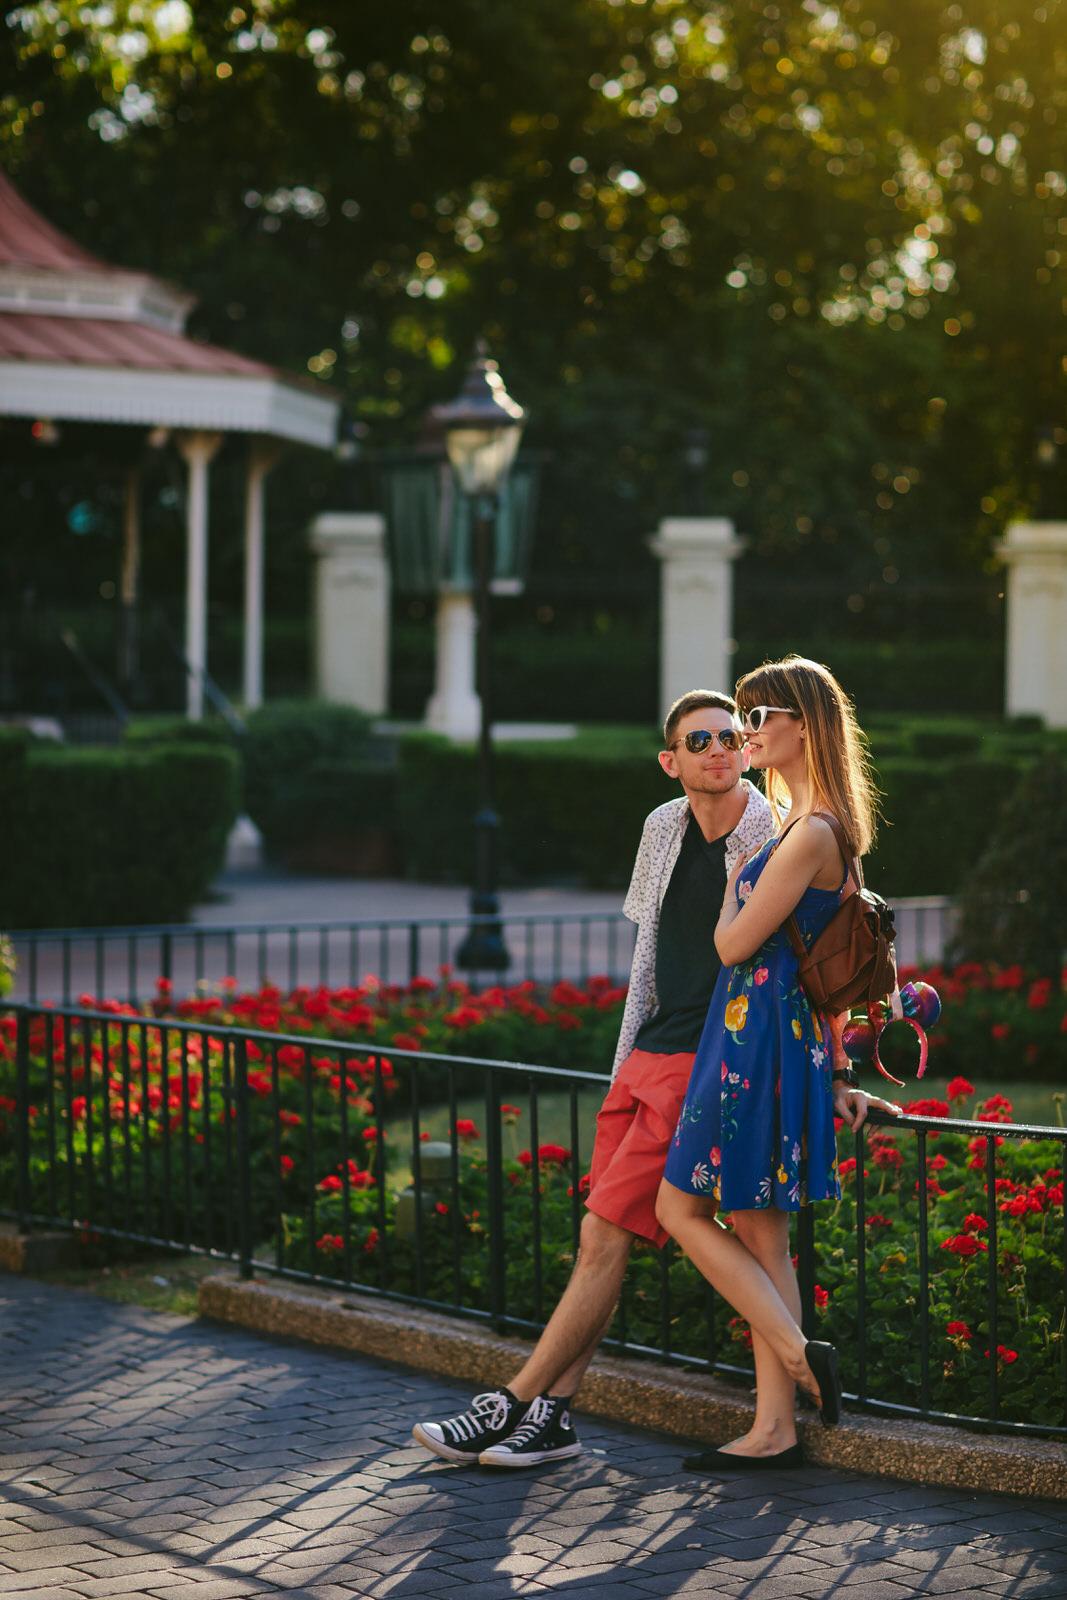 Adorable-Engagement-Session-Epcot-Orlando-Tiny-House-Photo-Wedding-Photographer-15.jpg